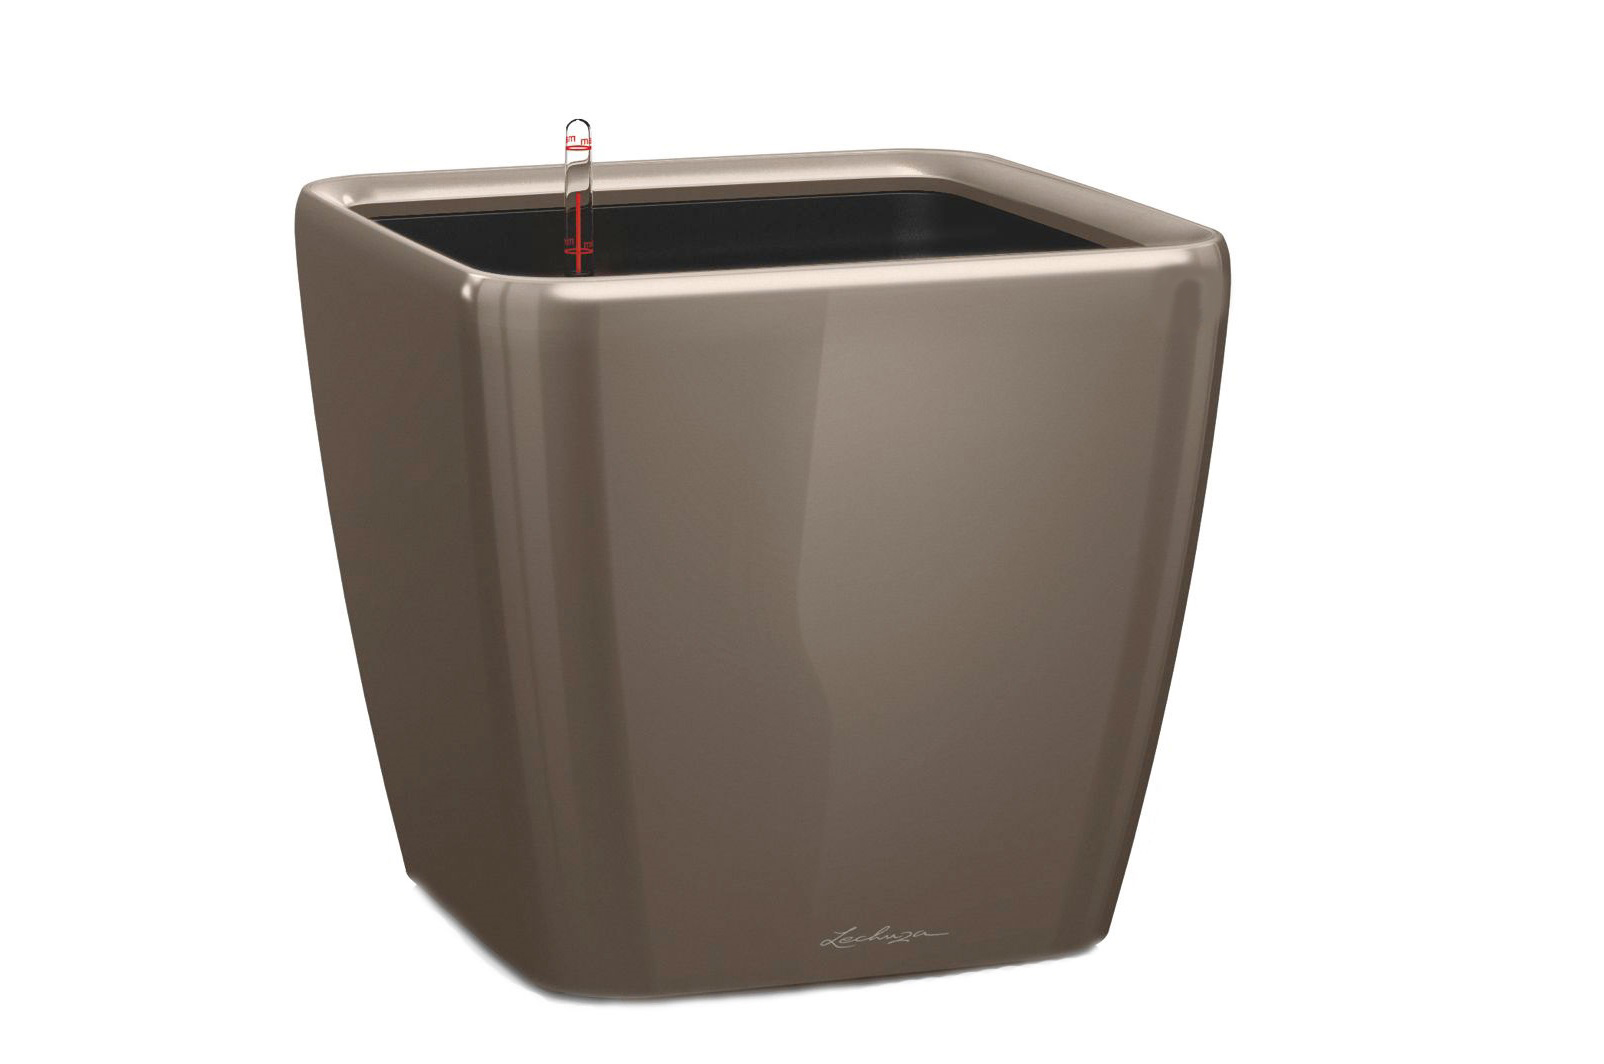 Кашпо с системой полива Квадро LSКашпо<br>Кашпо со съемным горшком.<br><br>Material: Пластик<br>Width см: 50<br>Depth см: 50<br>Height см: 47<br>Diameter см: None